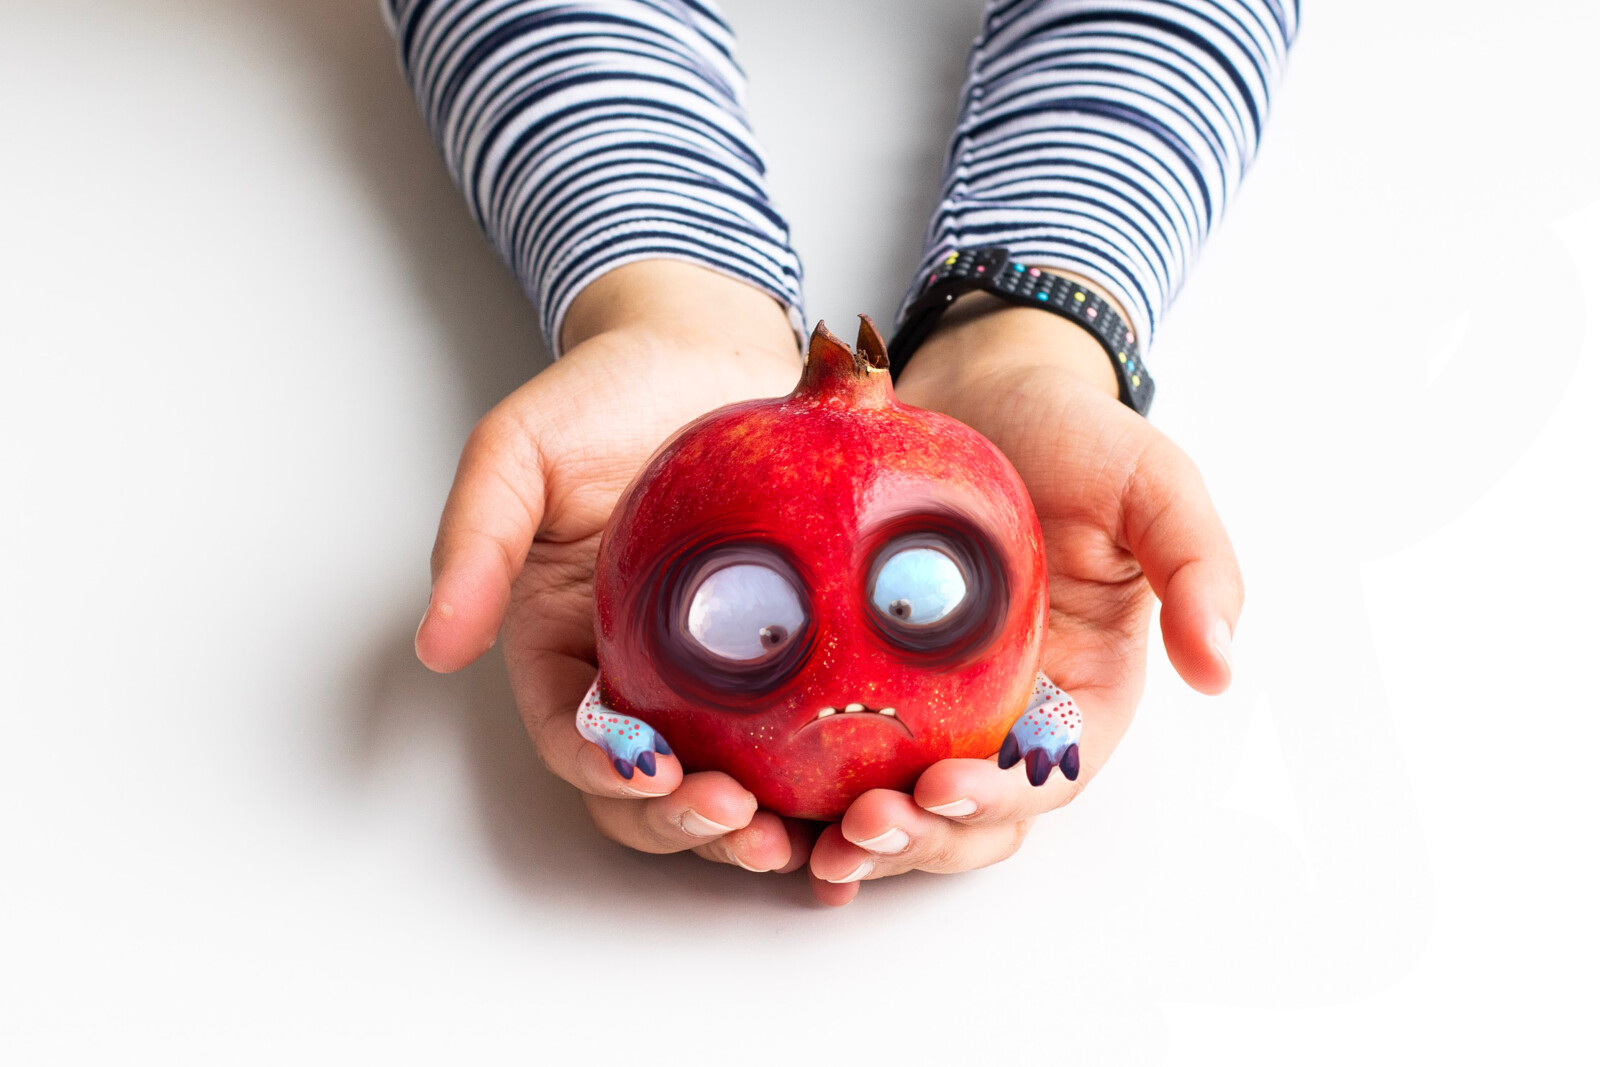 Pomegranate Creature